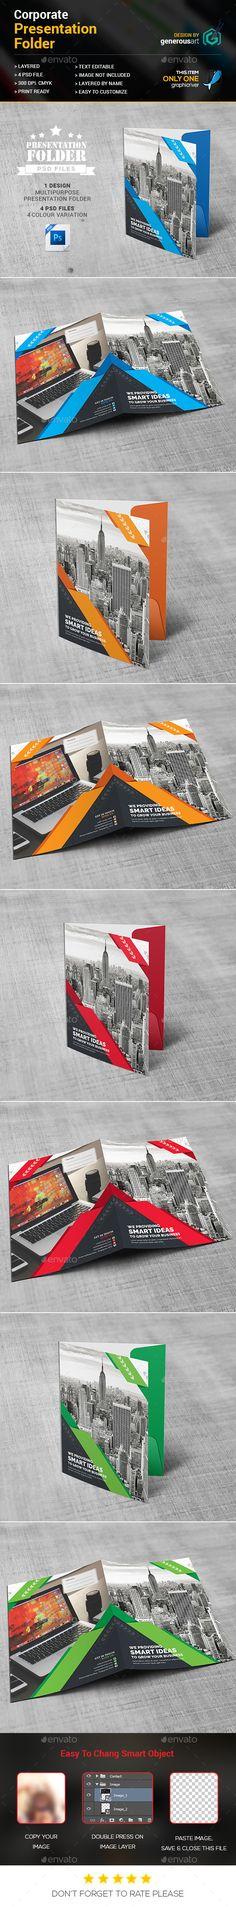 Corporate Presentation Folder Design Template - Stationery Print Template PSD. Download here: https://graphicriver.net/item/presentation-folder/17429340?ref=yinkira